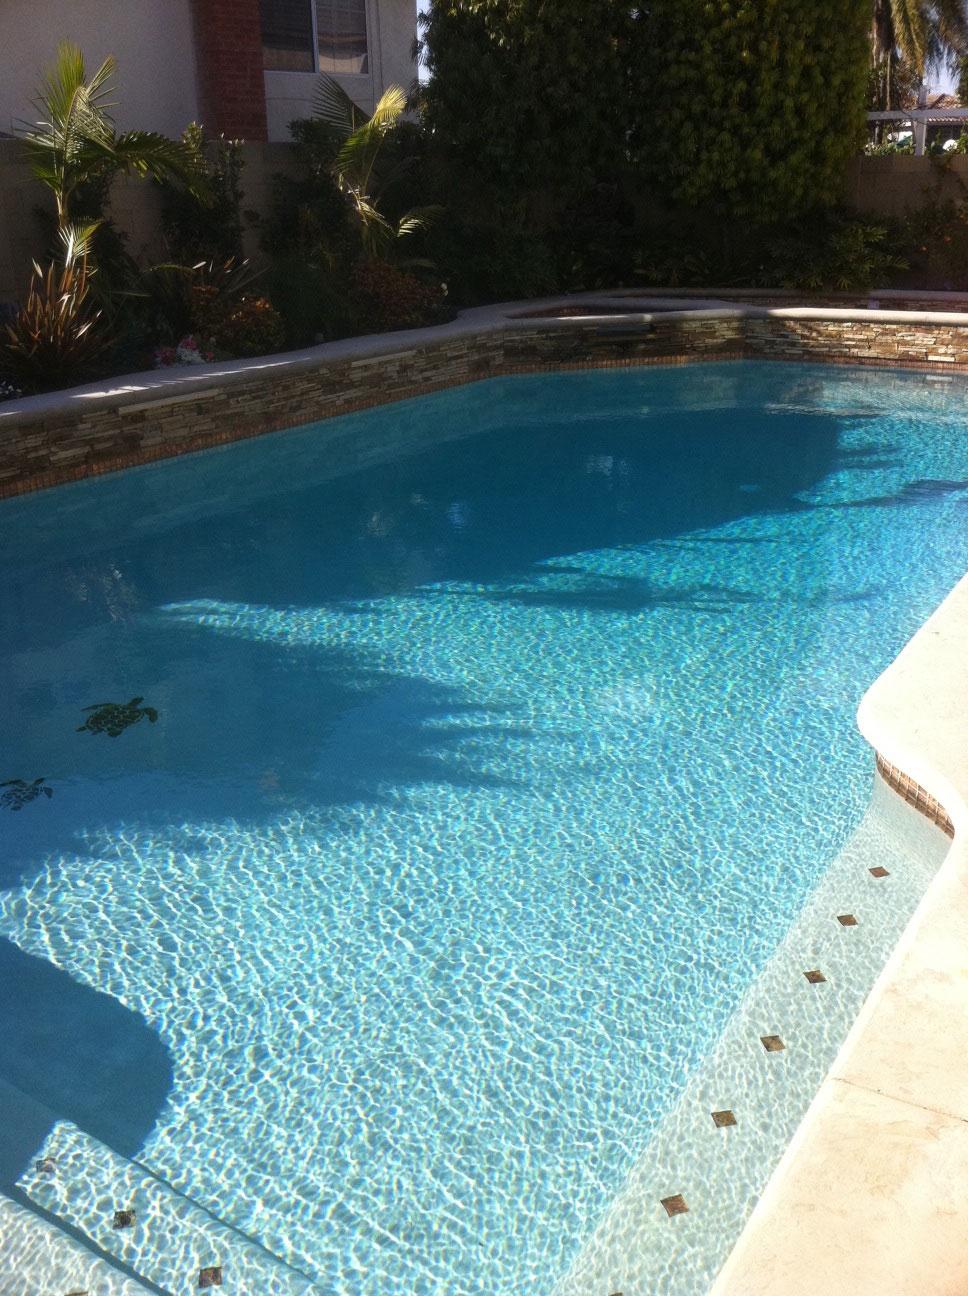 Pool Plastering Amazing Luxury Home Design